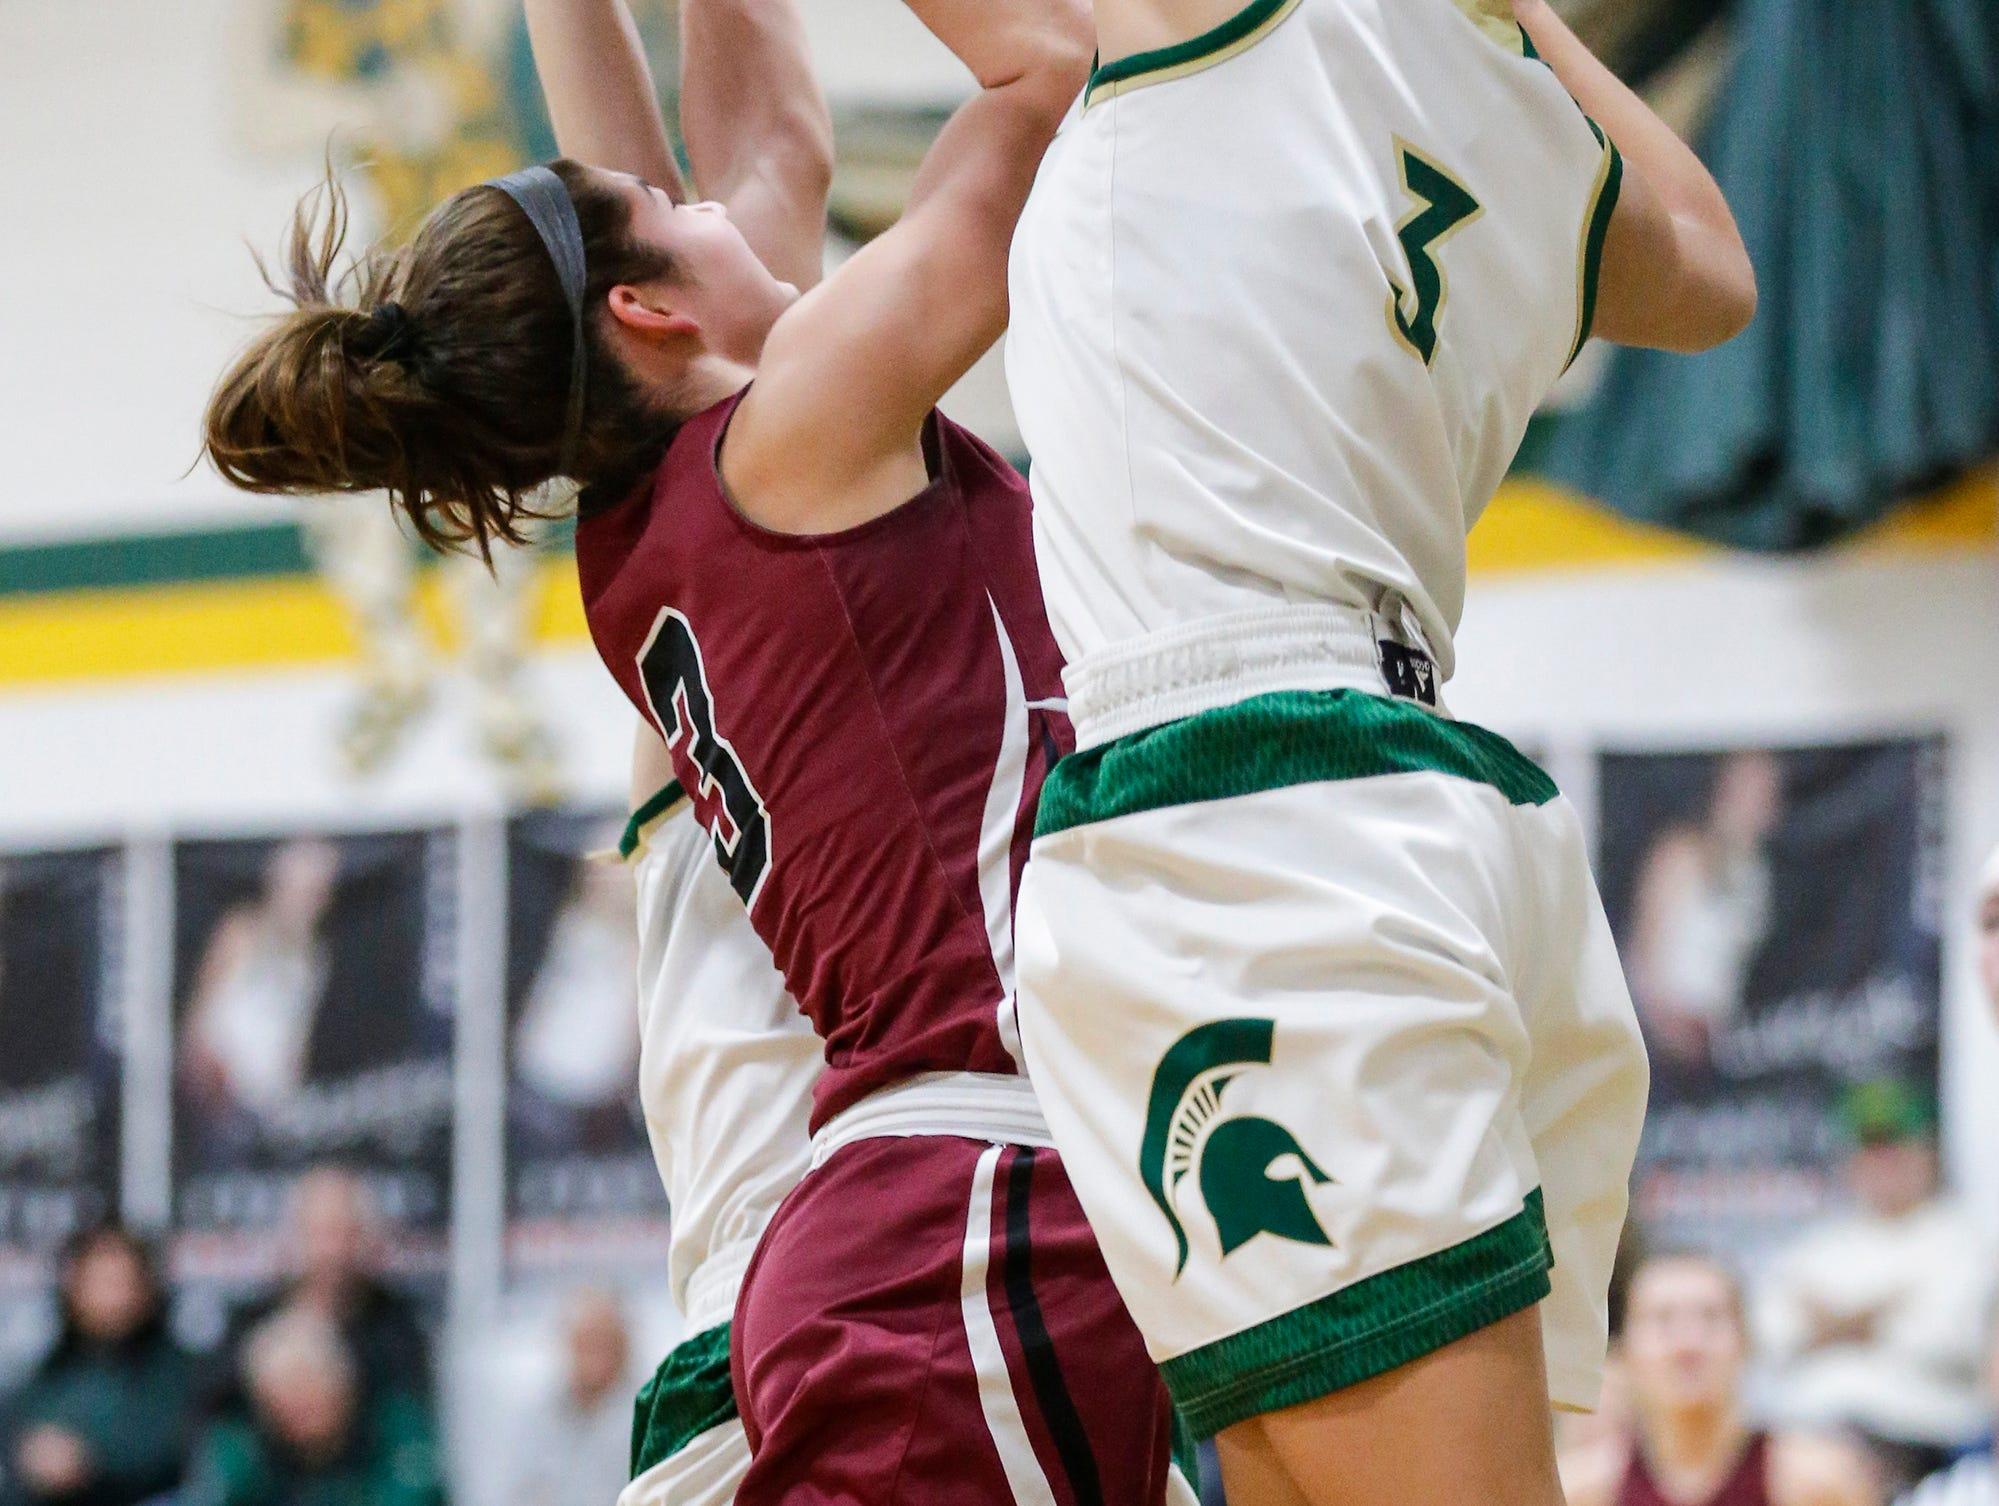 Laconia High School girls basketball's Kiarra Otto blocks a shot by Mayville High School's Amber Schraufnagel during their game Friday, November 30, 2018 in Rosendale. Doug Raflik/USA TODAY NETWORK-Wisconsin